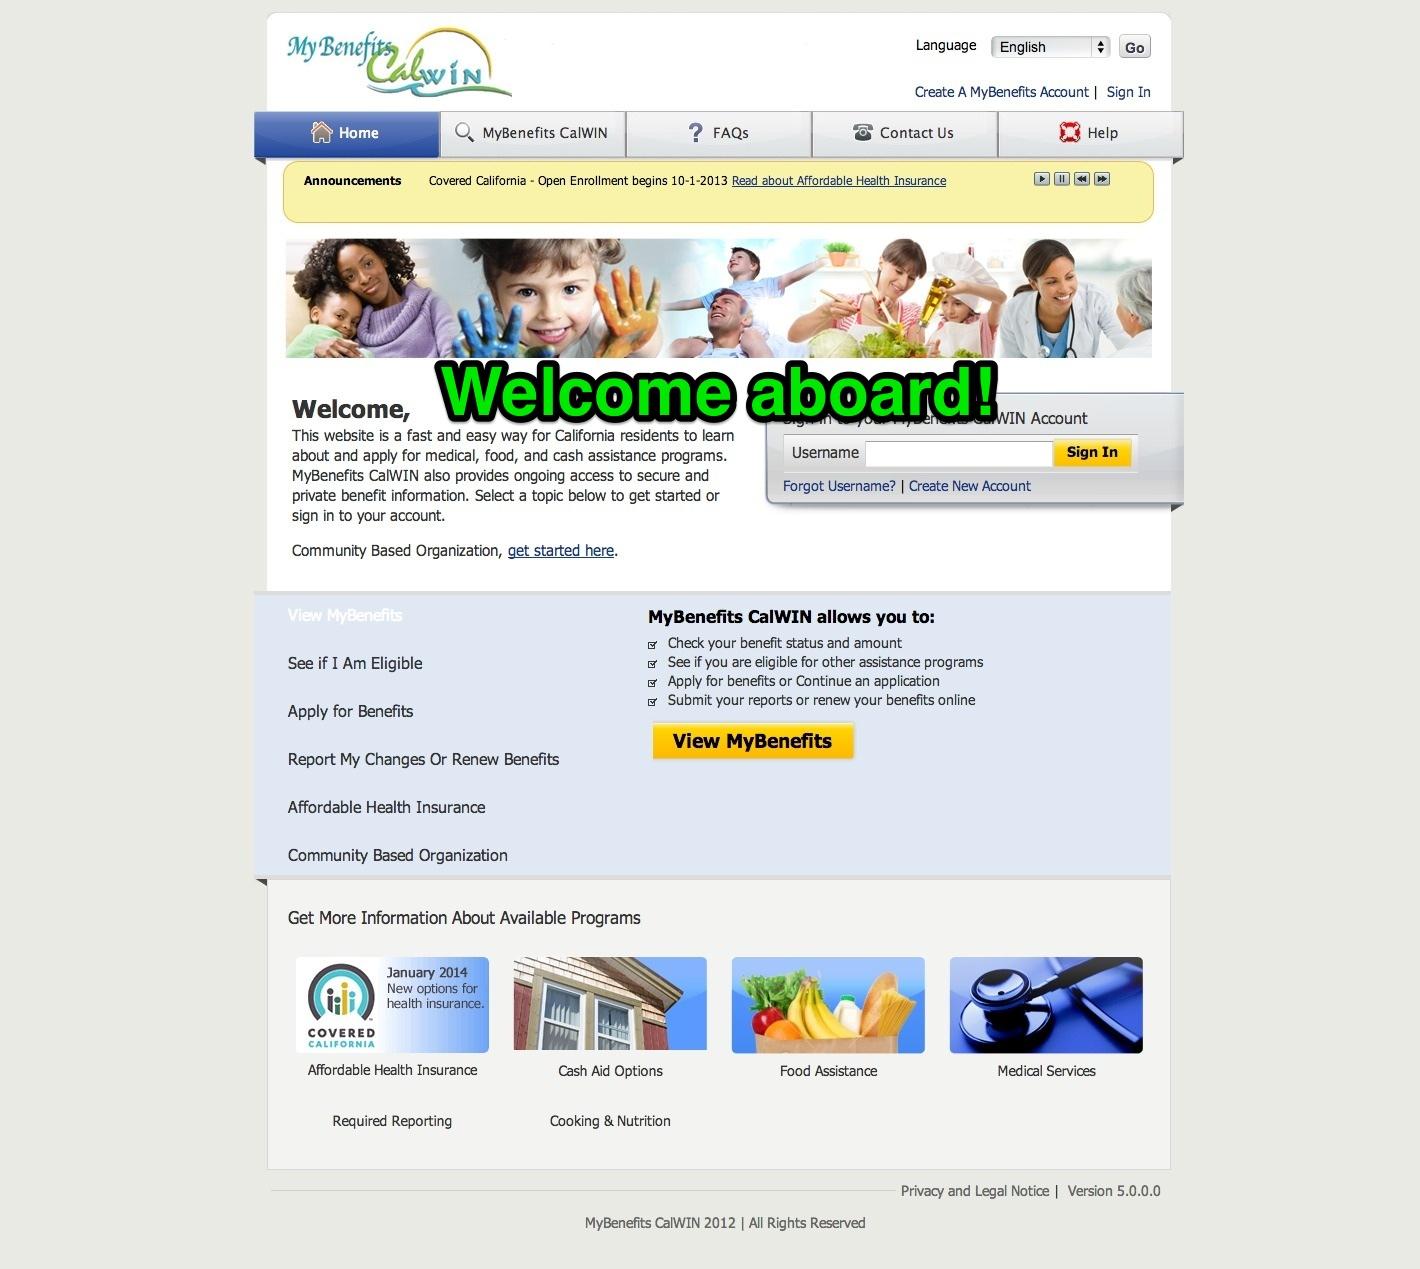 Application For Calfresh Benefits